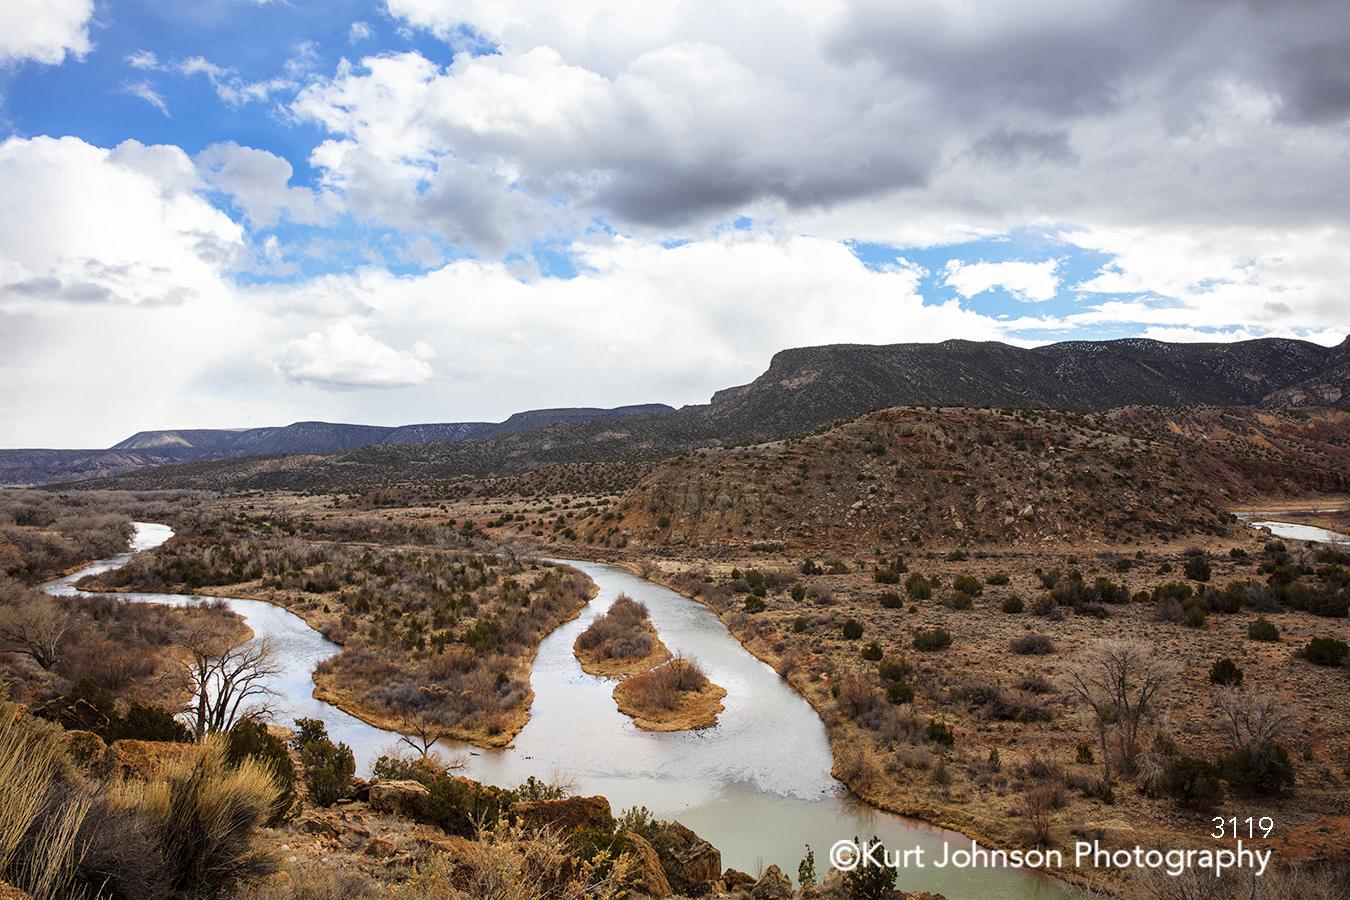 landscape southwest desert santa fe new mexico brown trees brush blue sky clouds indigenous